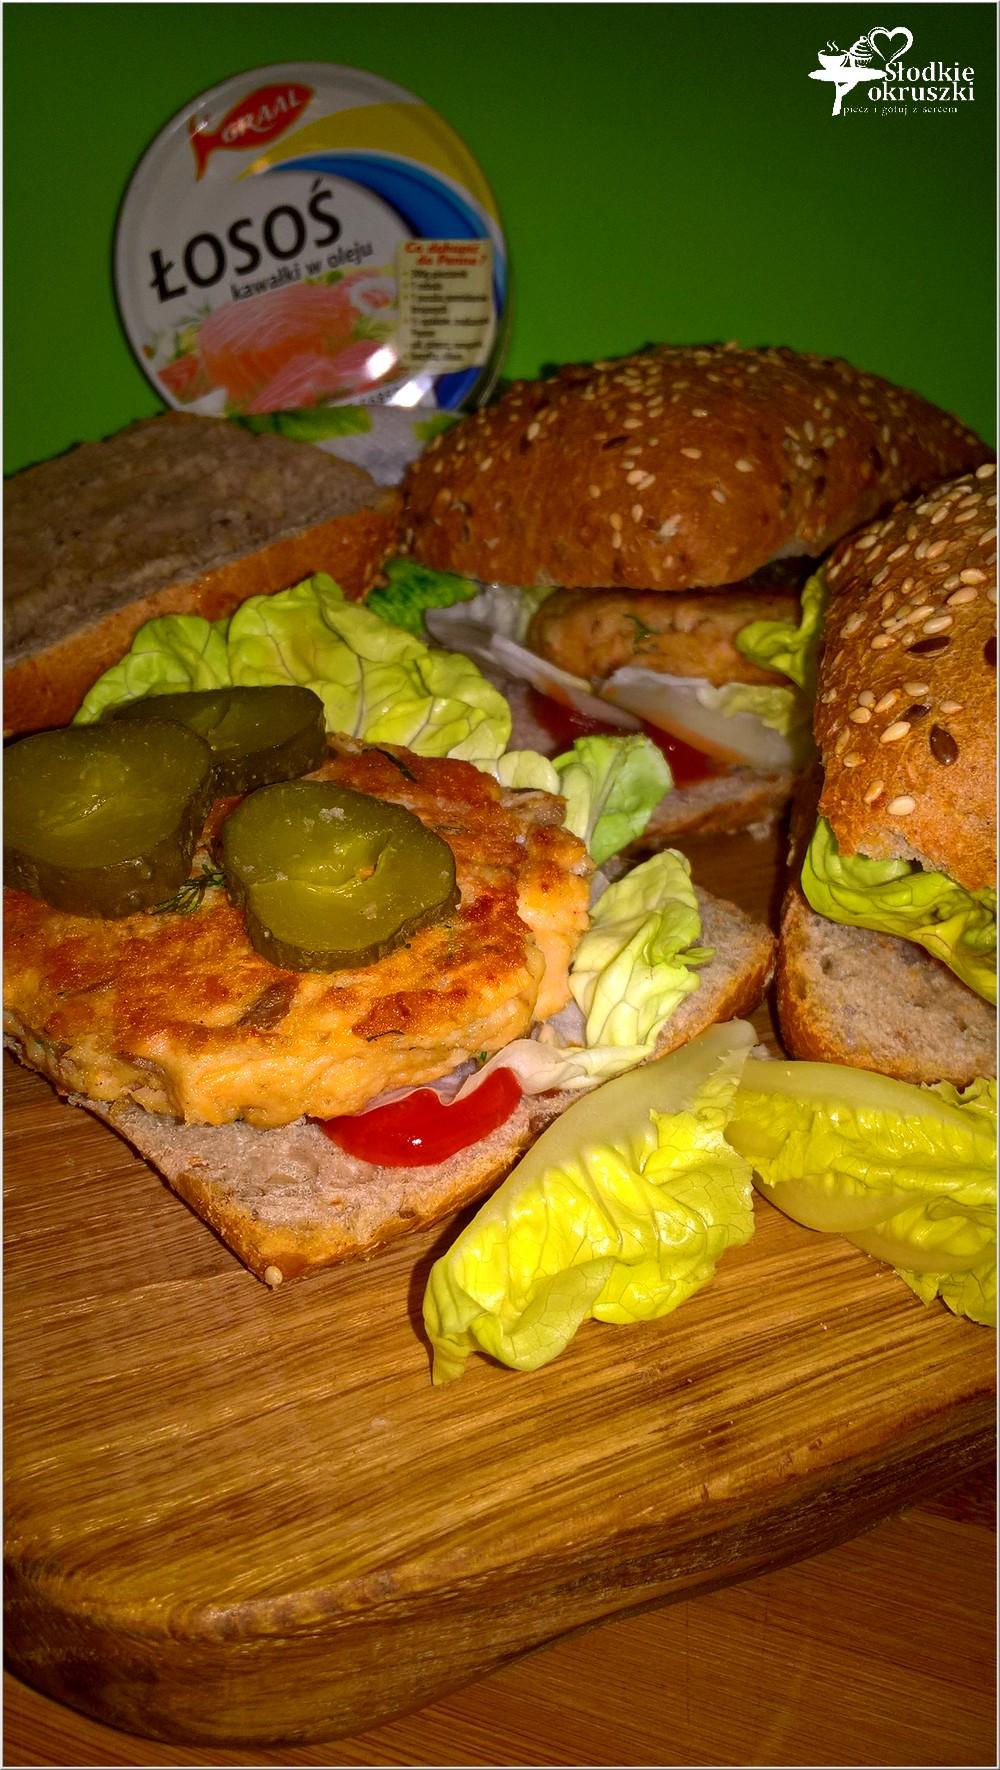 zdrowe-burgery-rybne-z-kotletem-z-lososia-4